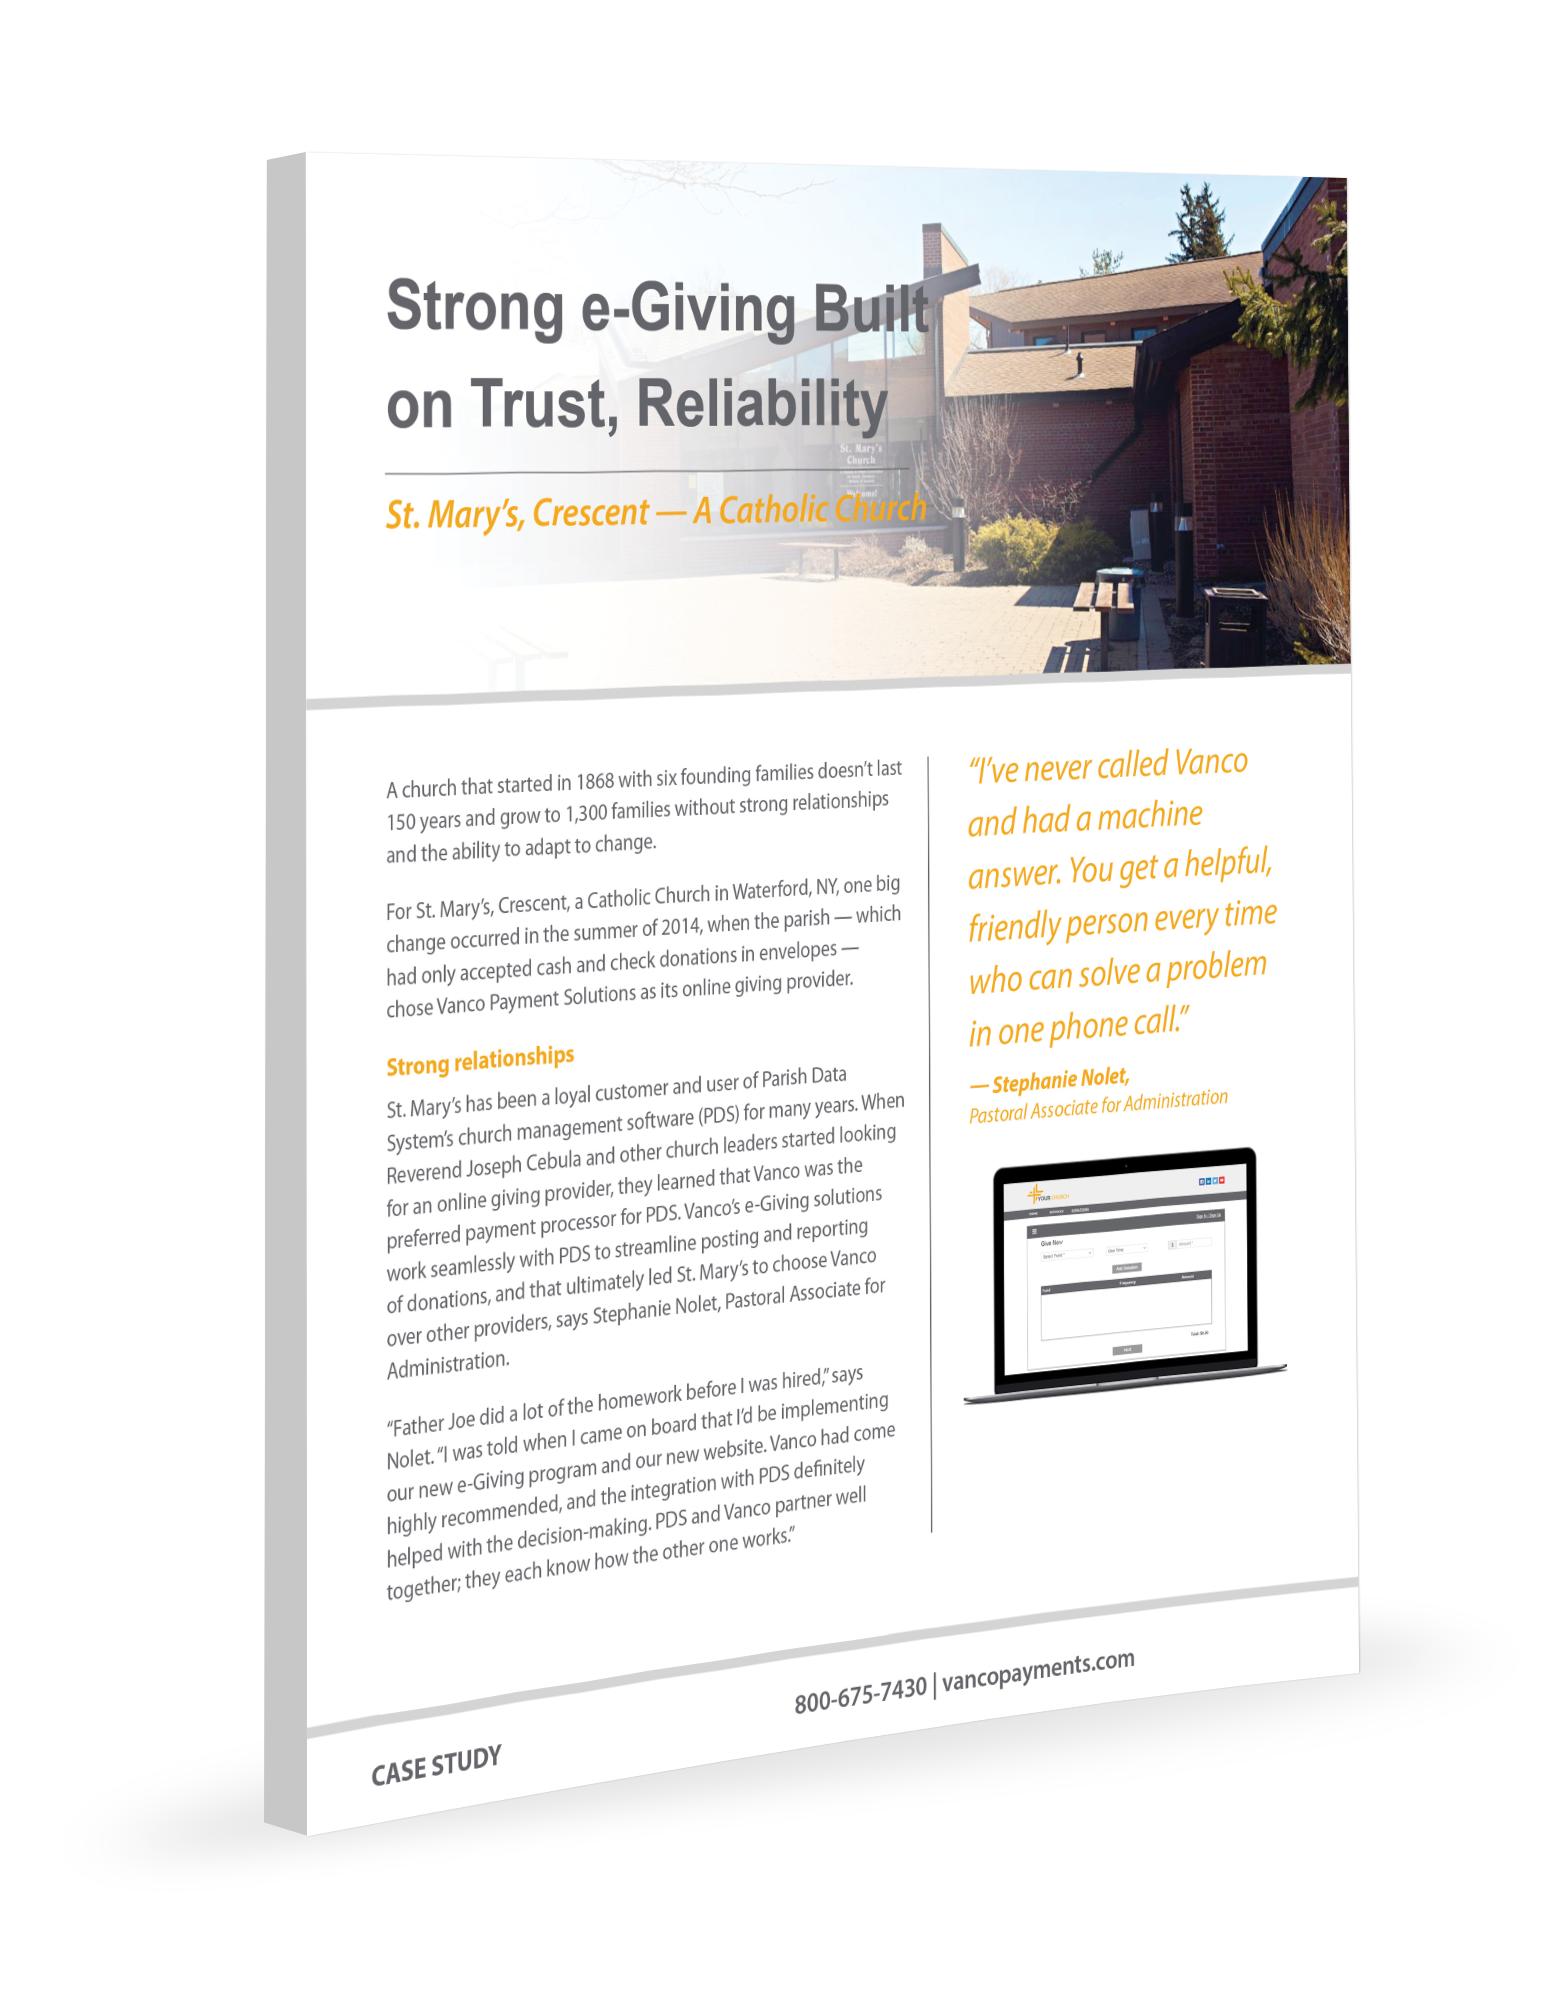 Case Study_Strong eGiving Built on Trust